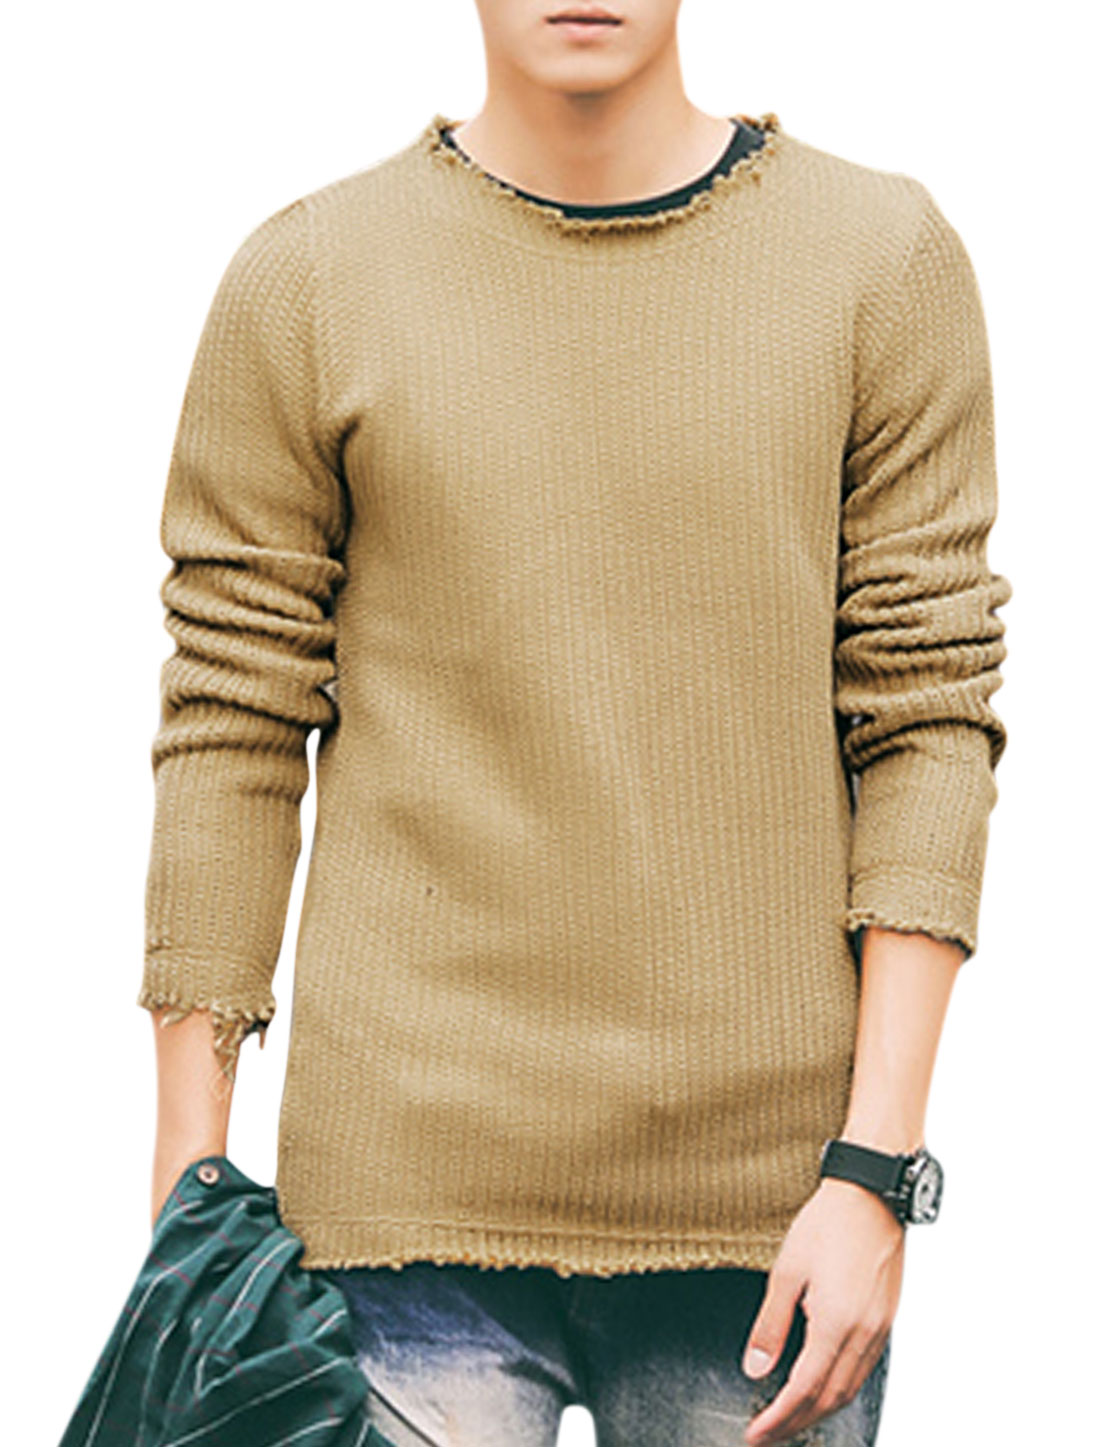 Men Pullover Long Sleeve Destroyed Trim Casual Knit Shirt Khaki M